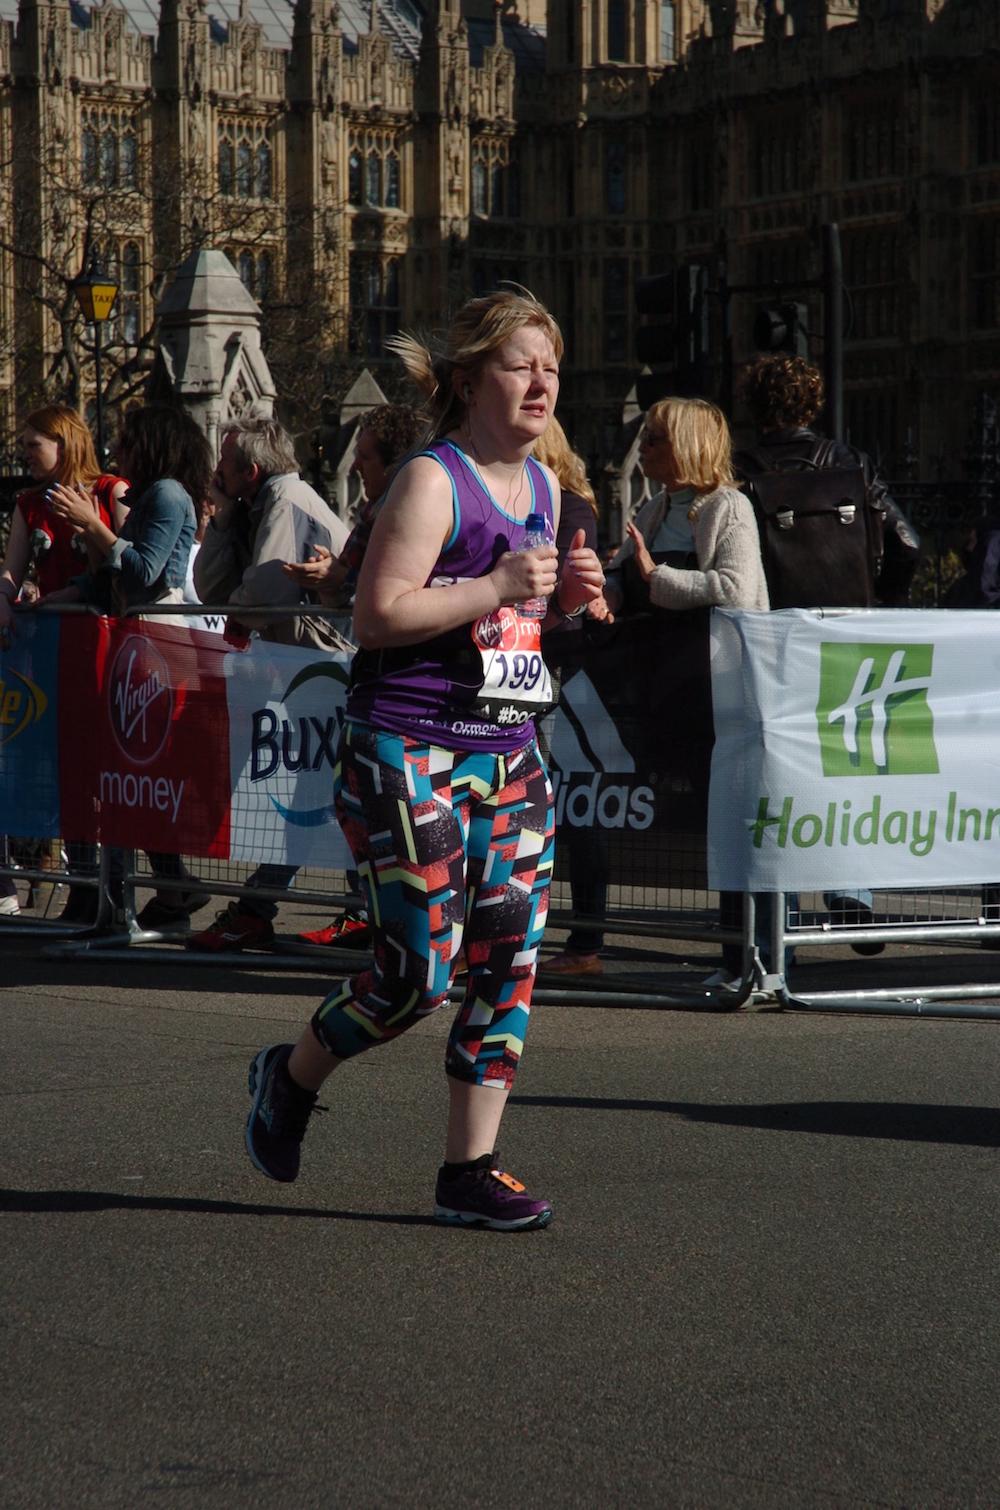 Running the London Marathon